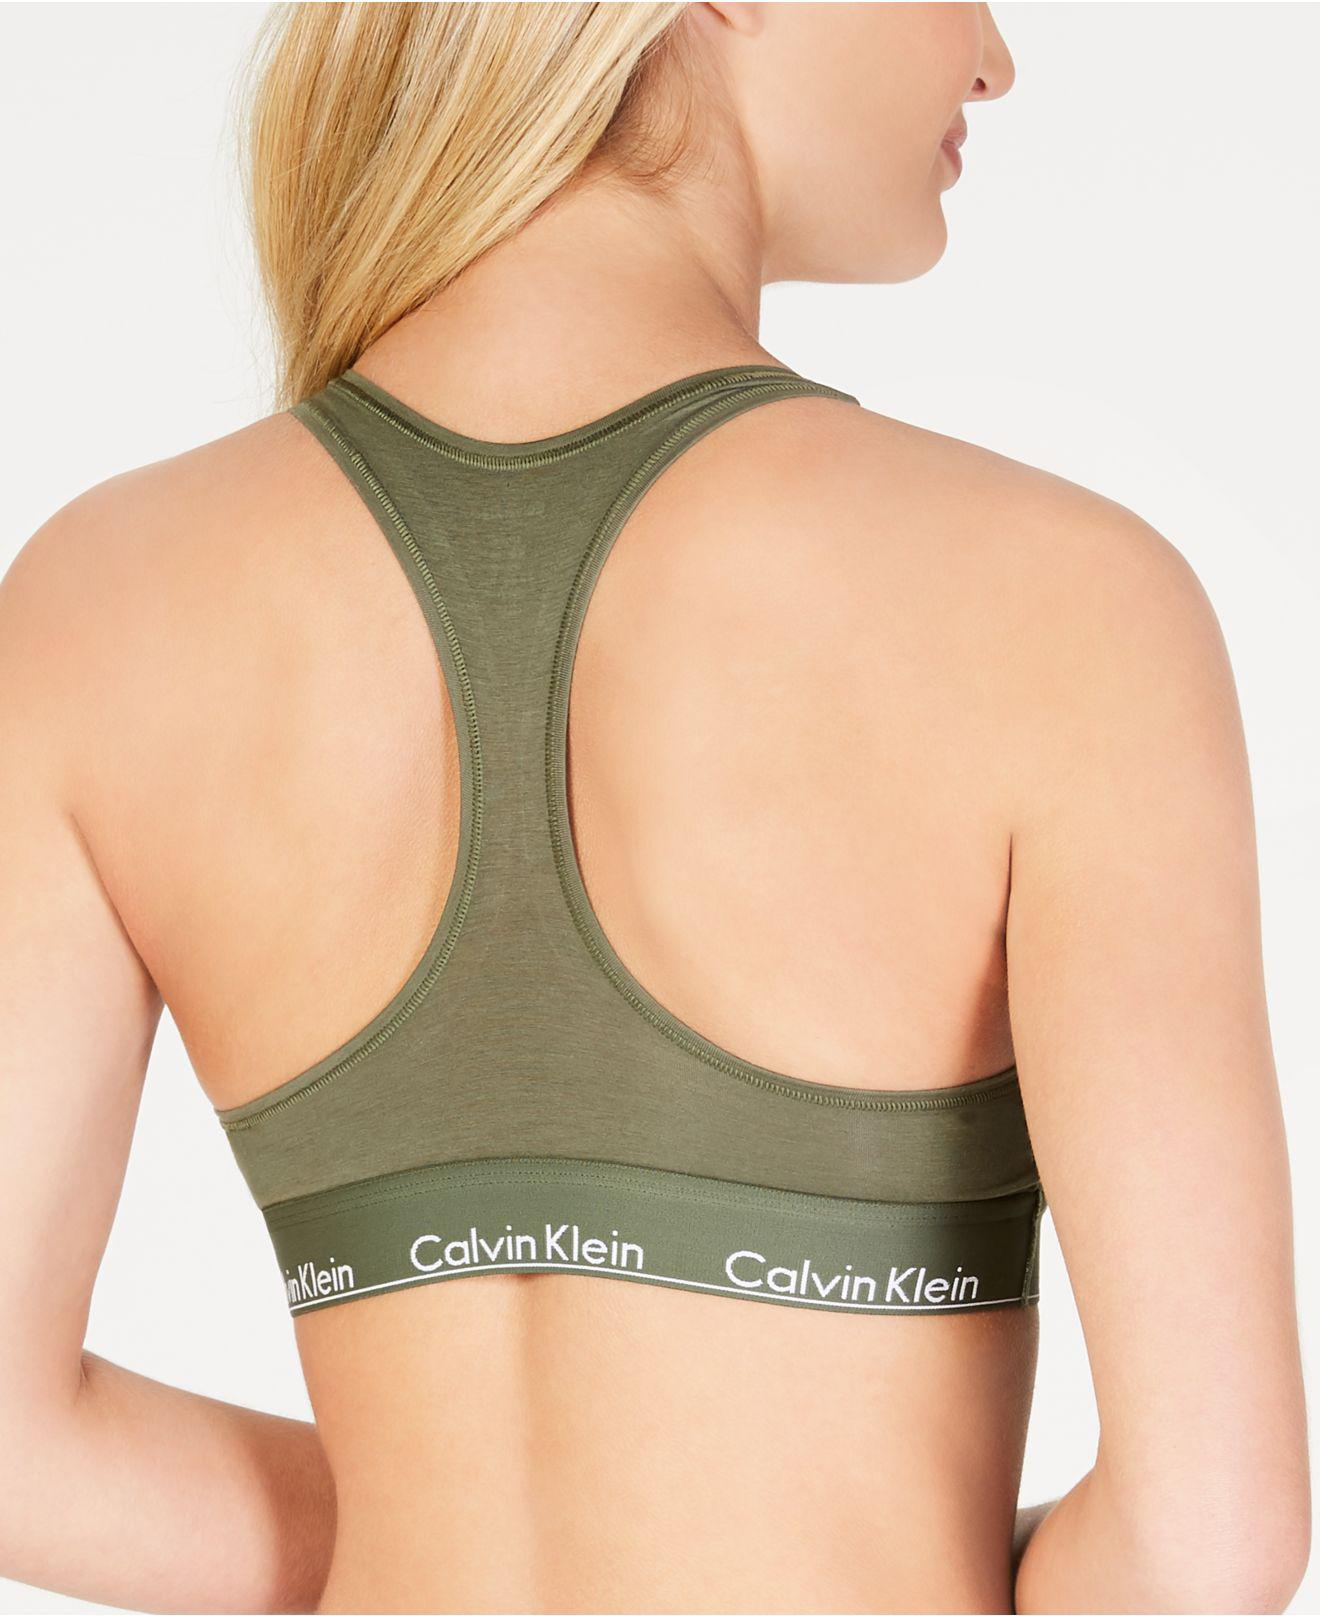 ad50aec363d22 Lyst - Calvin Klein Modern Cotton Unlined Bralette in Green - Save  53.57142857142857%